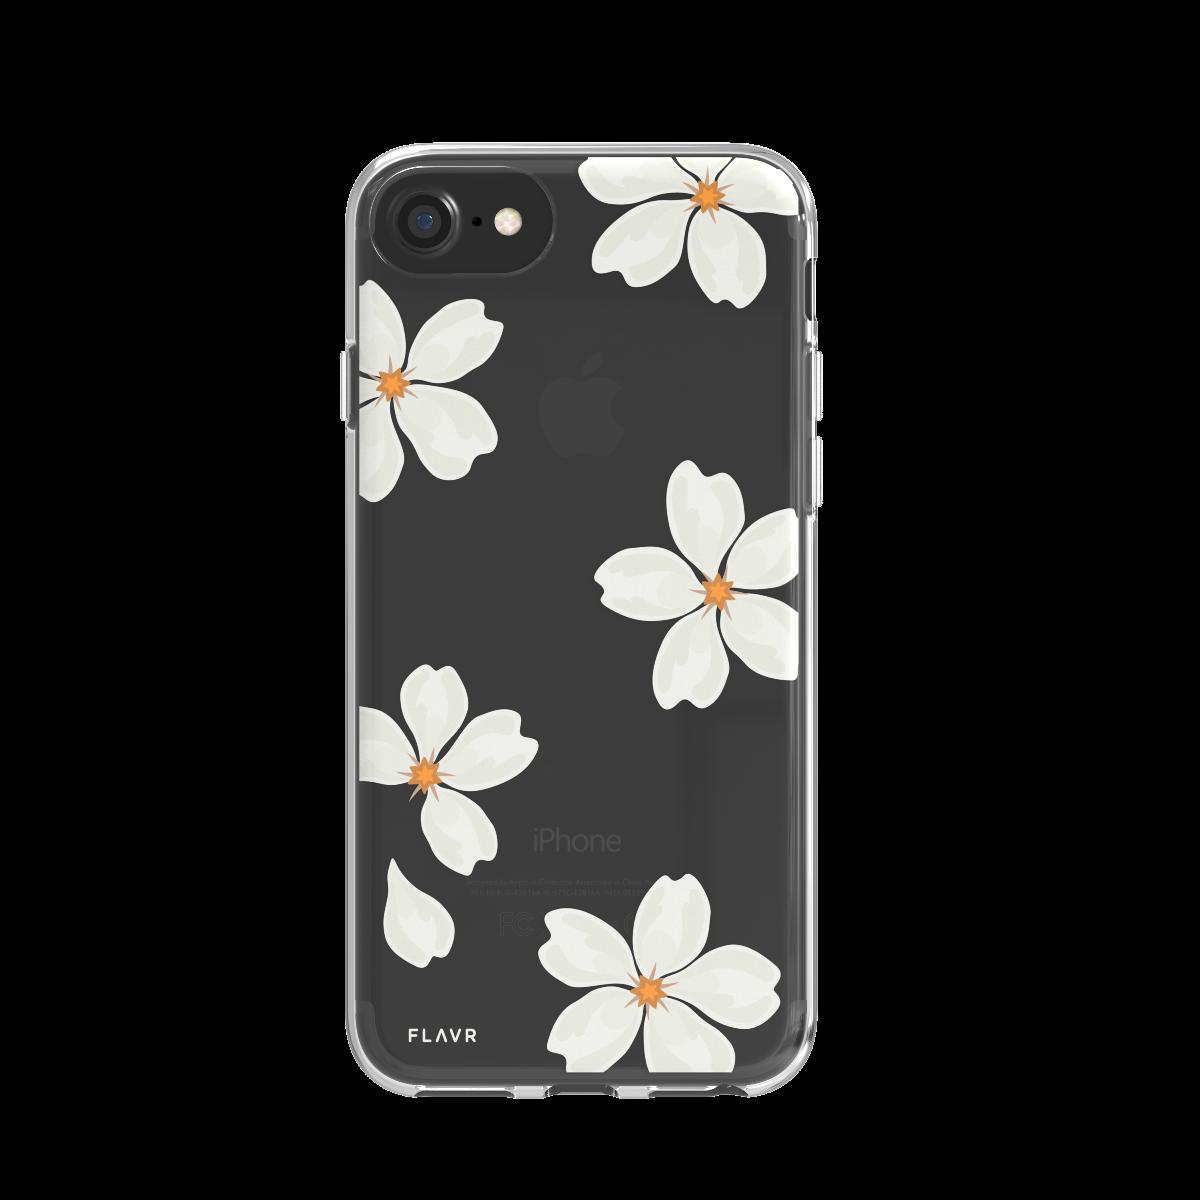 Ochranný kryt pro iPhone 8 / 7 / 6s / 6 - FLAVR, WHITE PETALS